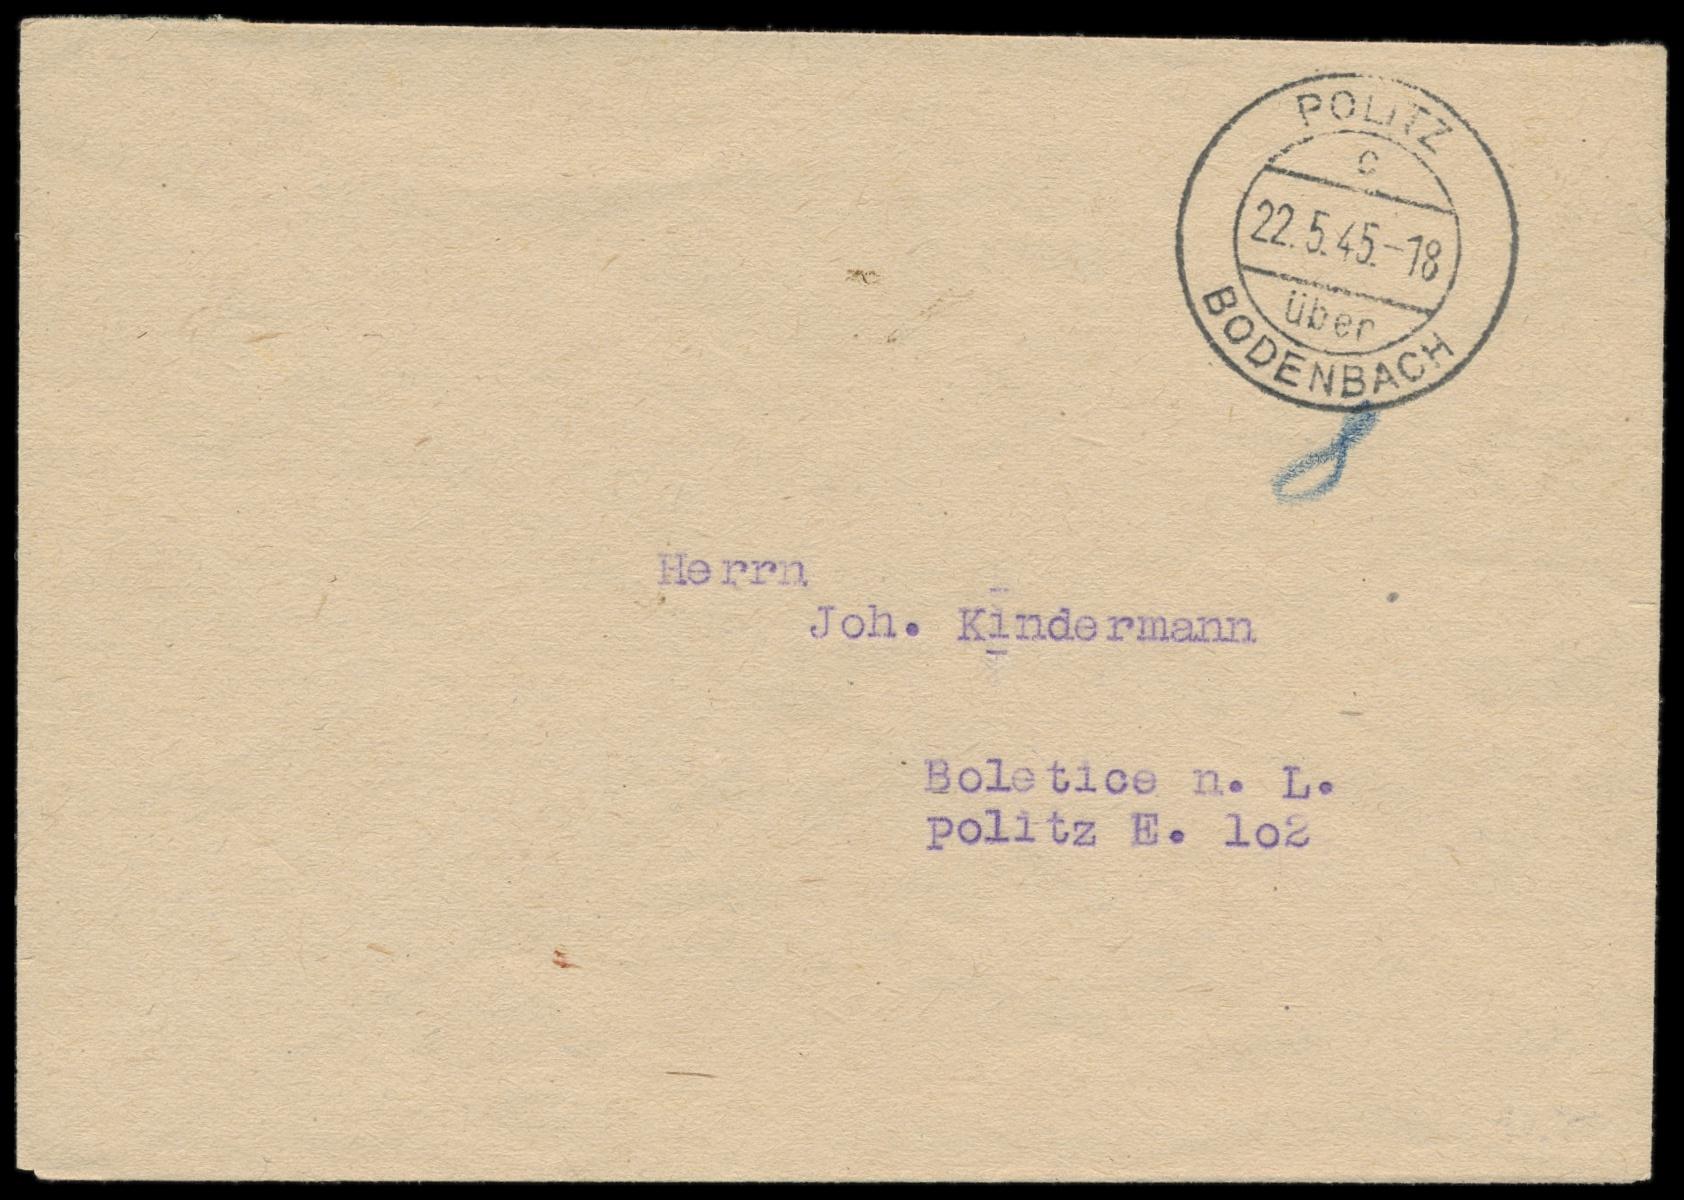 Lot 2594 - Main catalogue sudetenland -  Peter Harlos Auctions 42. Harlos Auktion